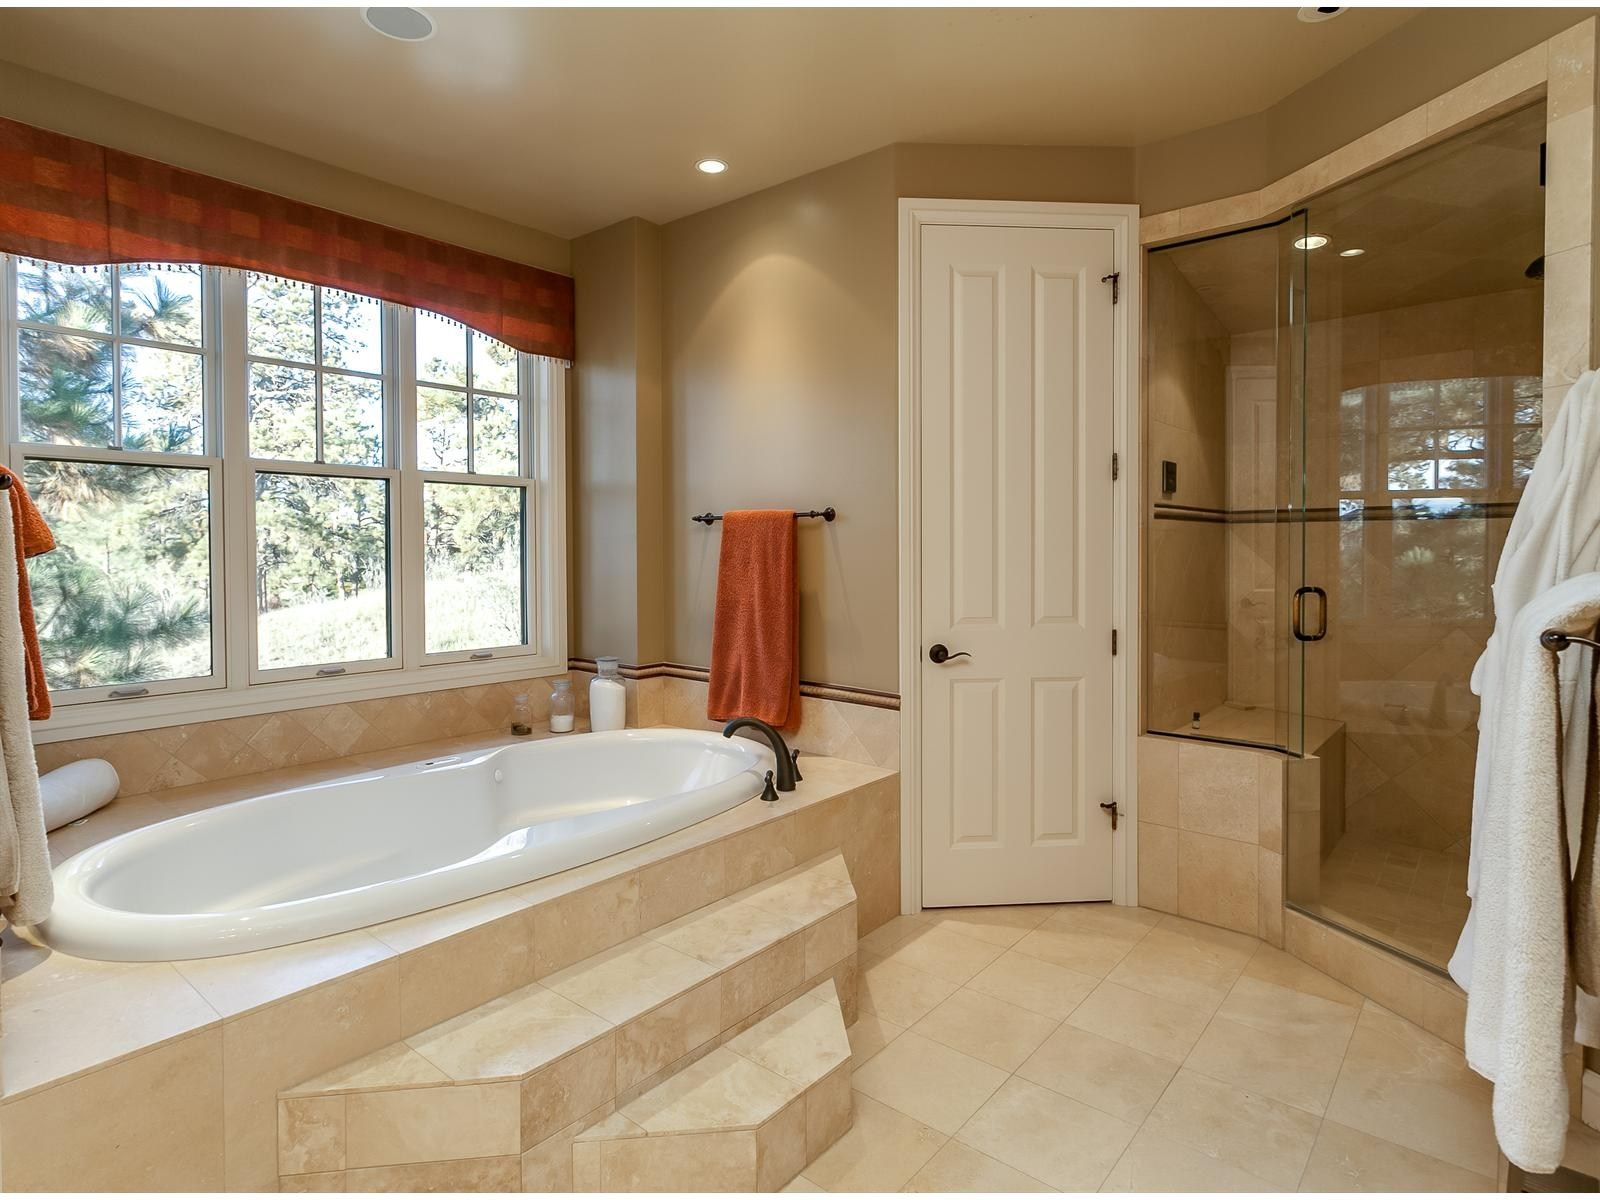 steps to tub | Home | Pinterest | Tubs, Bath room and Virtual tour